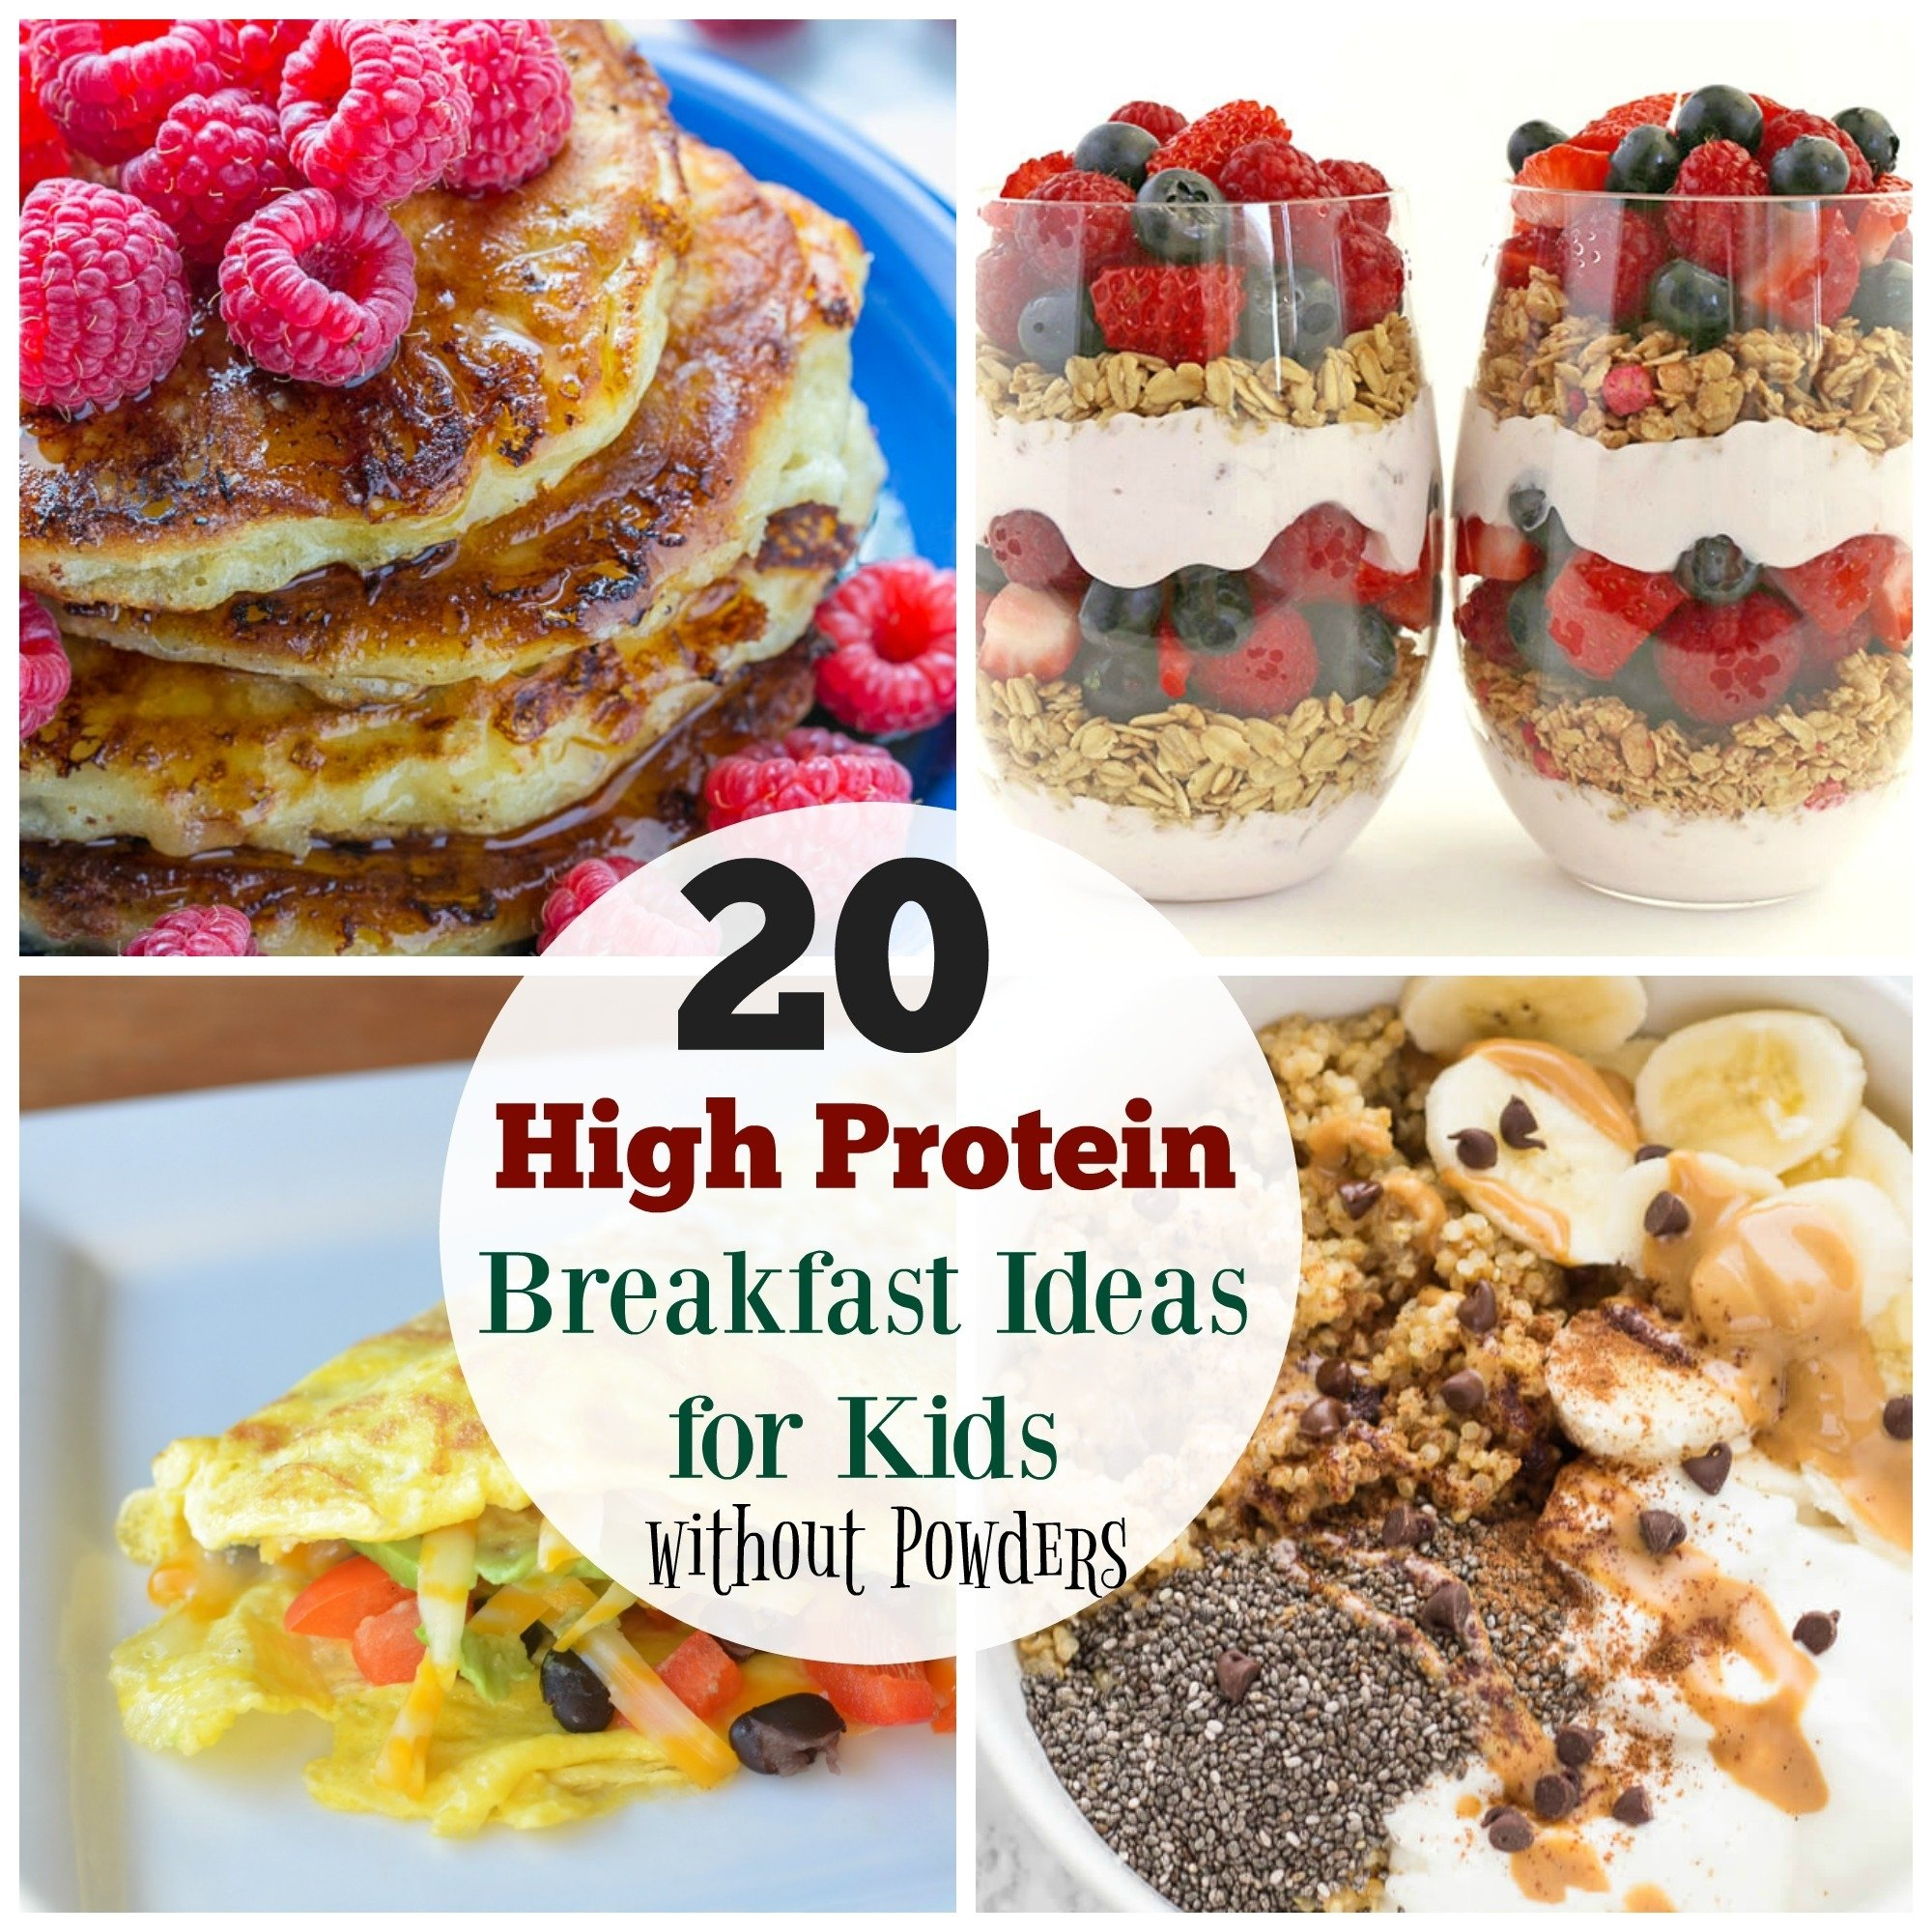 10 Trendy Good Breakfast Ideas For Kids 20 high protein breakfast ideas for kids the organized mom 2021